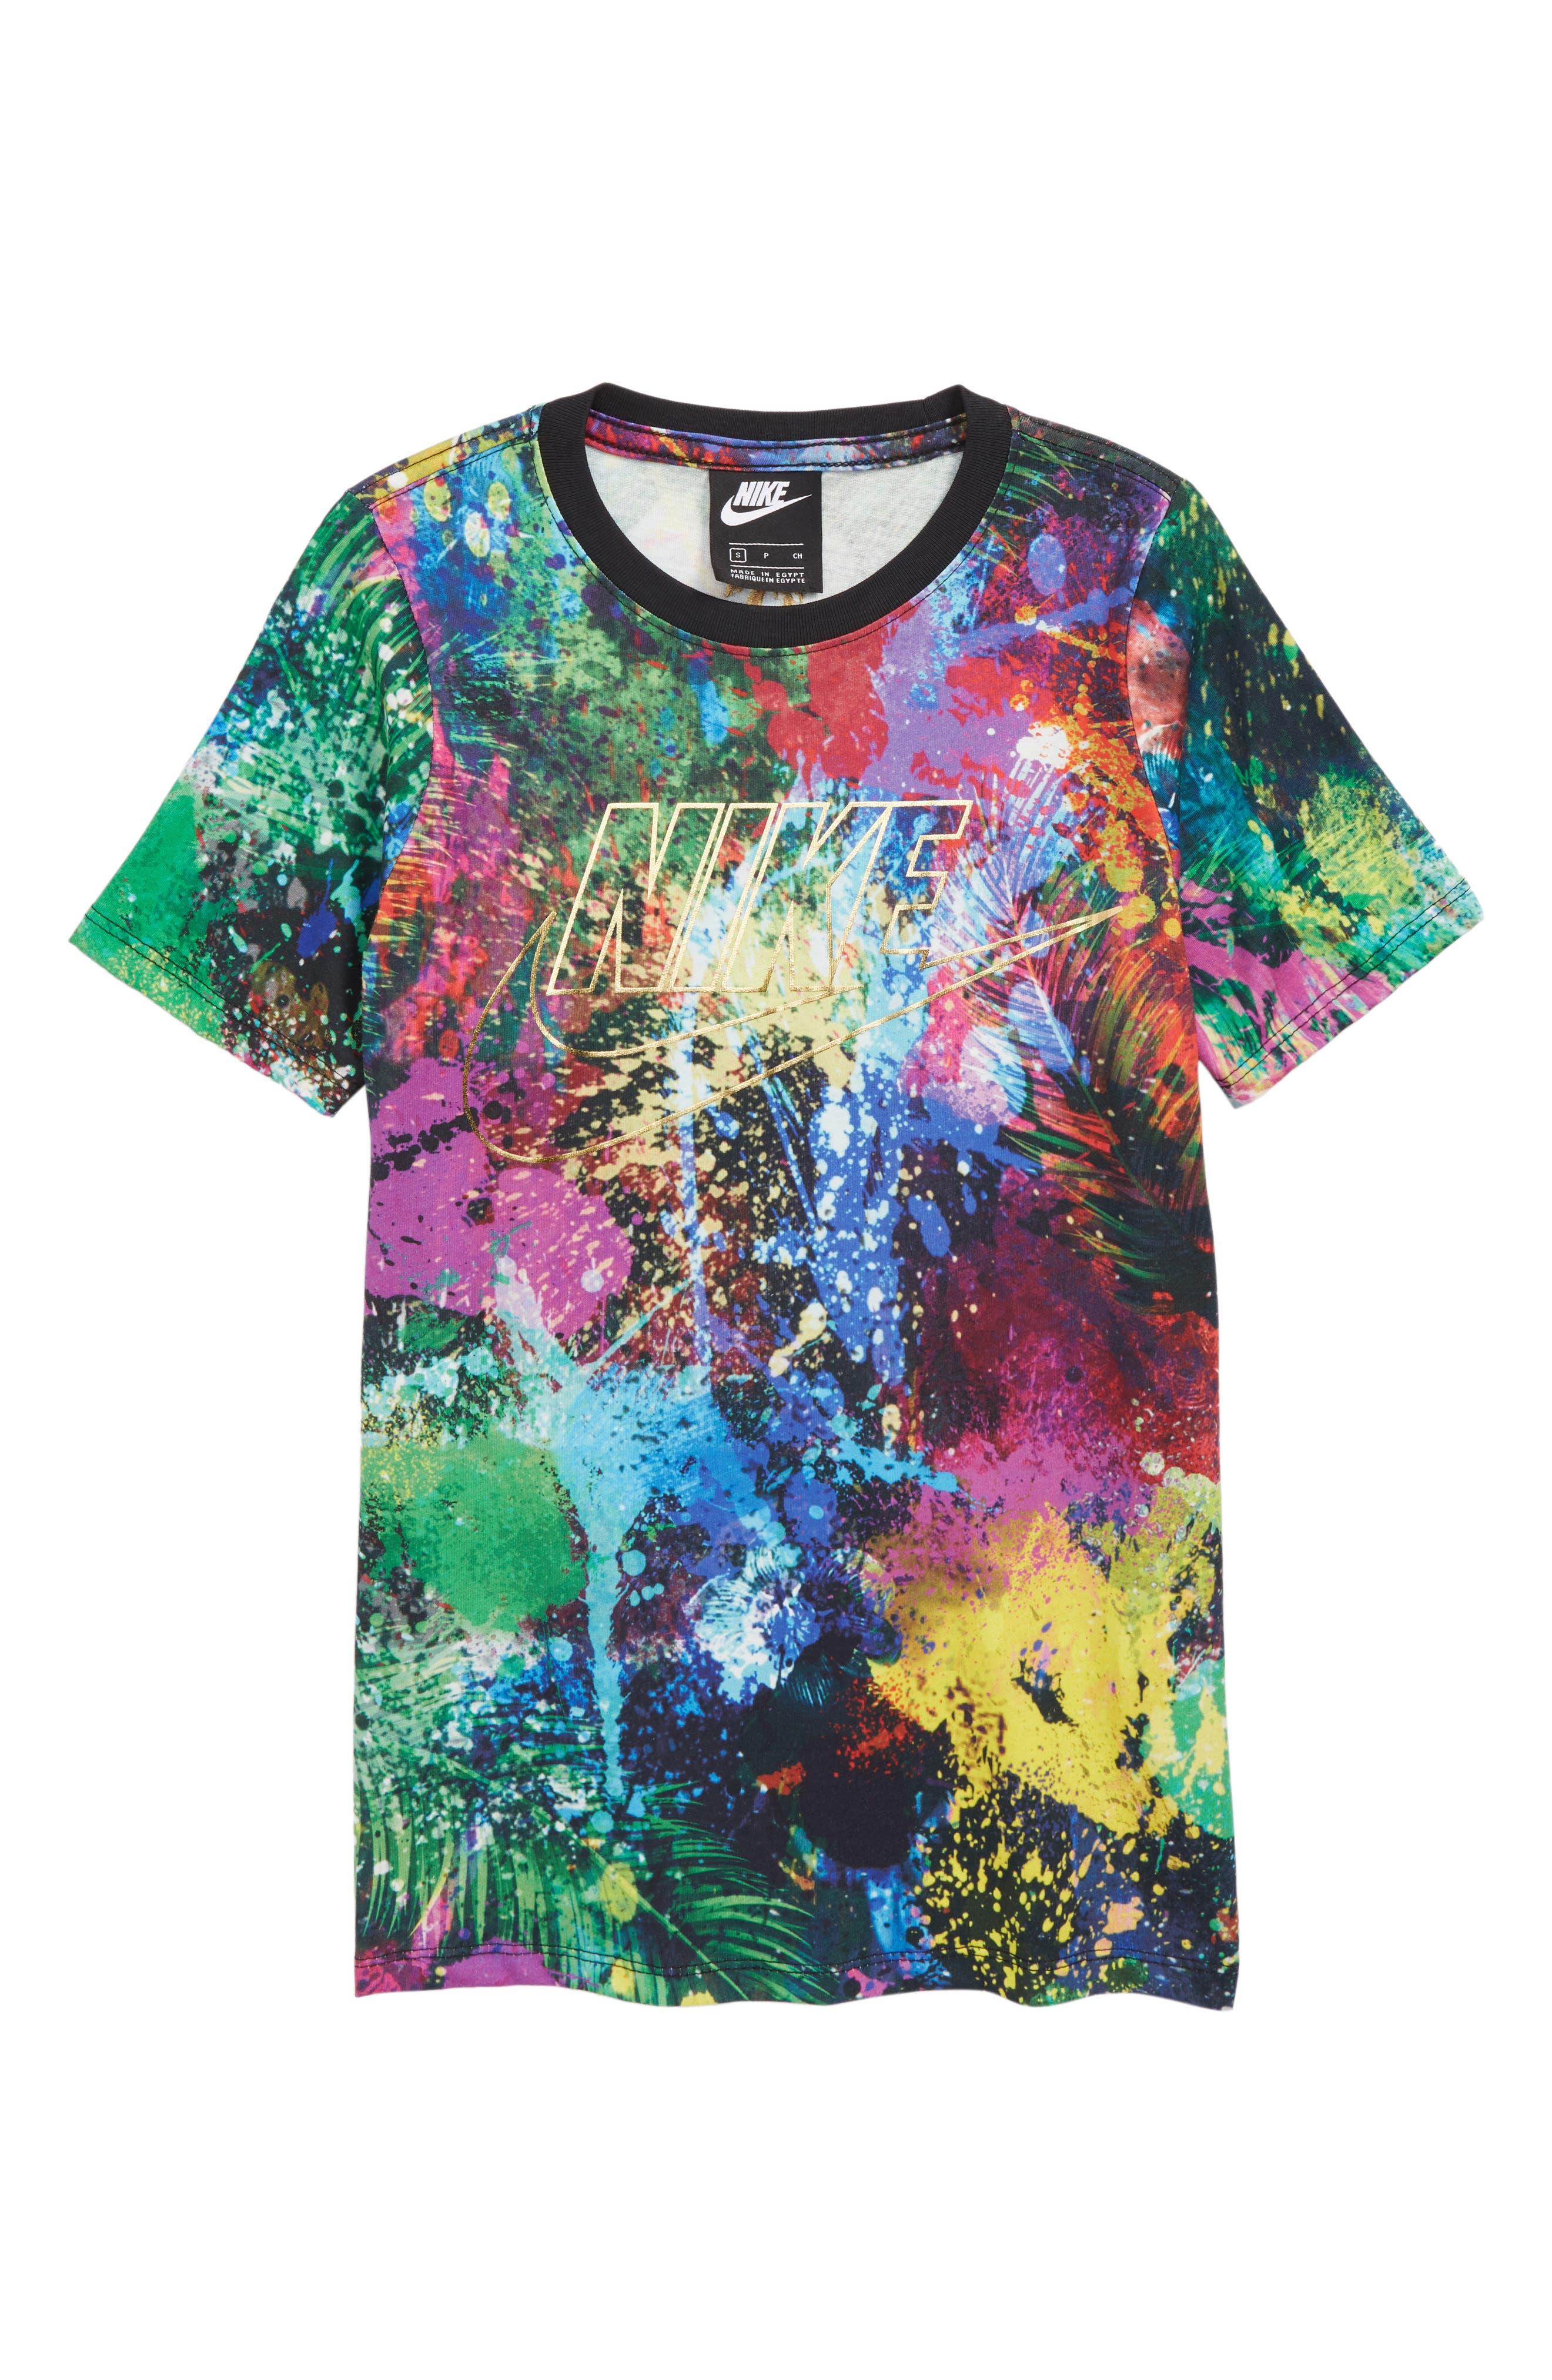 Sportswear Parade T-Shirt,                         Main,                         color, 010